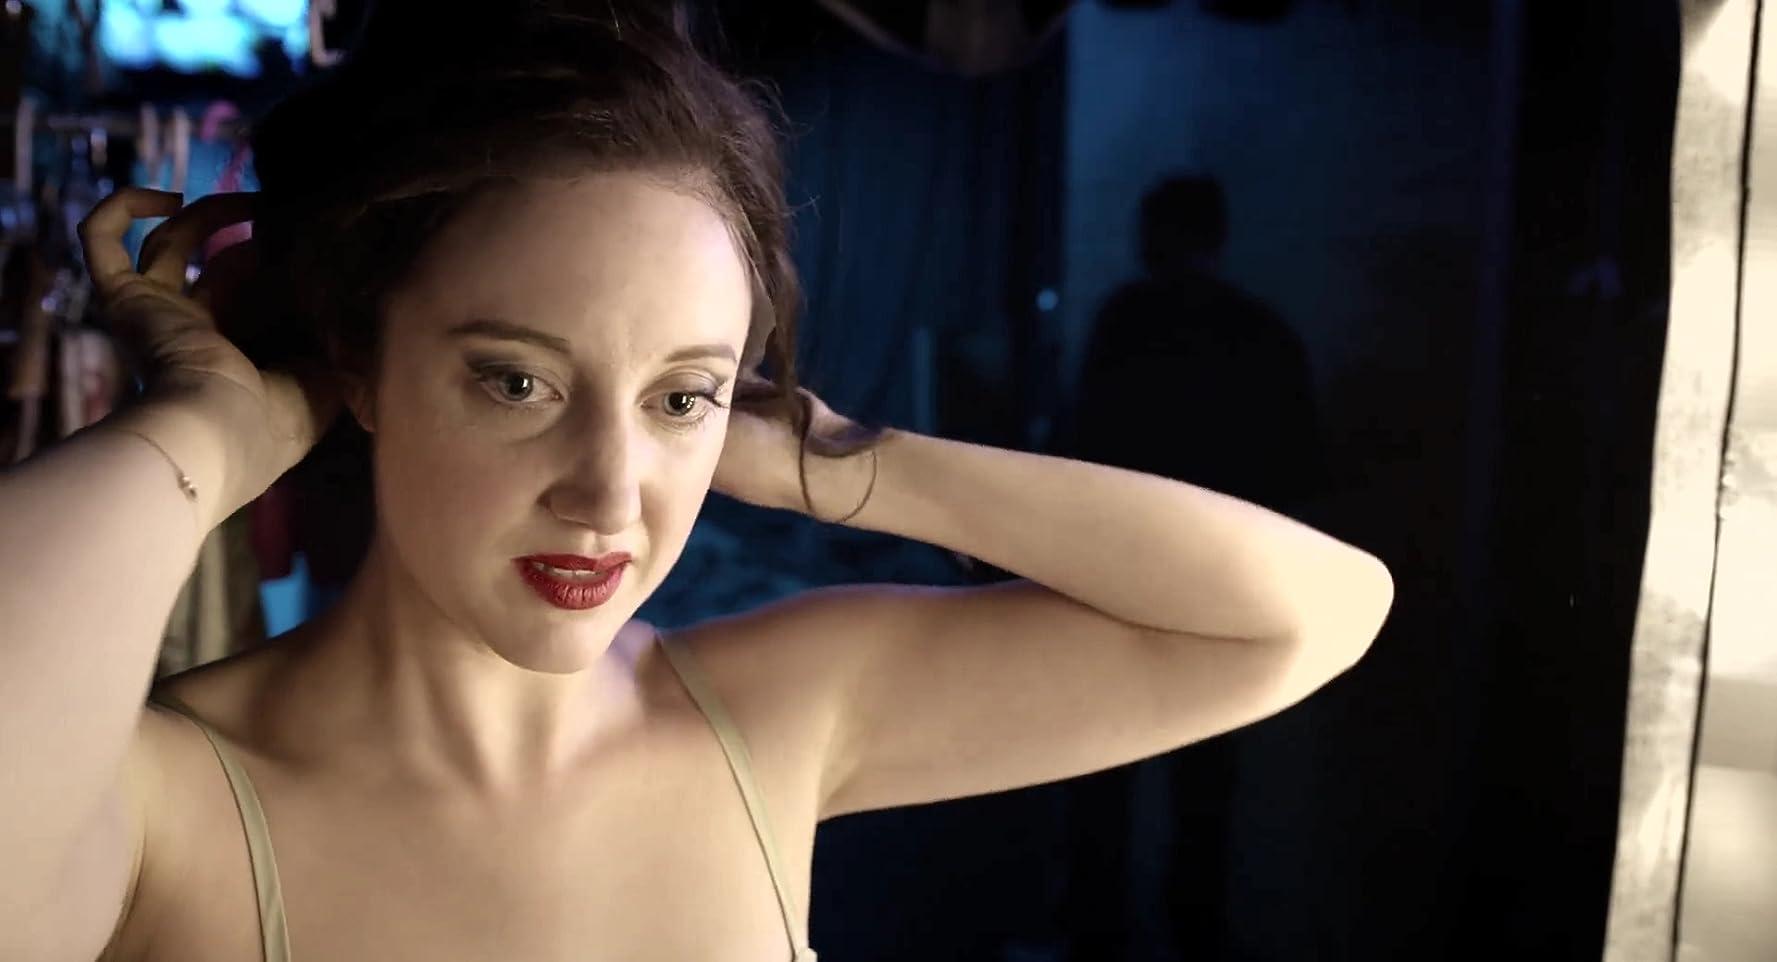 Youtube Karolina Wozniak nudes (14 foto and video), Topless, Leaked, Selfie, lingerie 2015